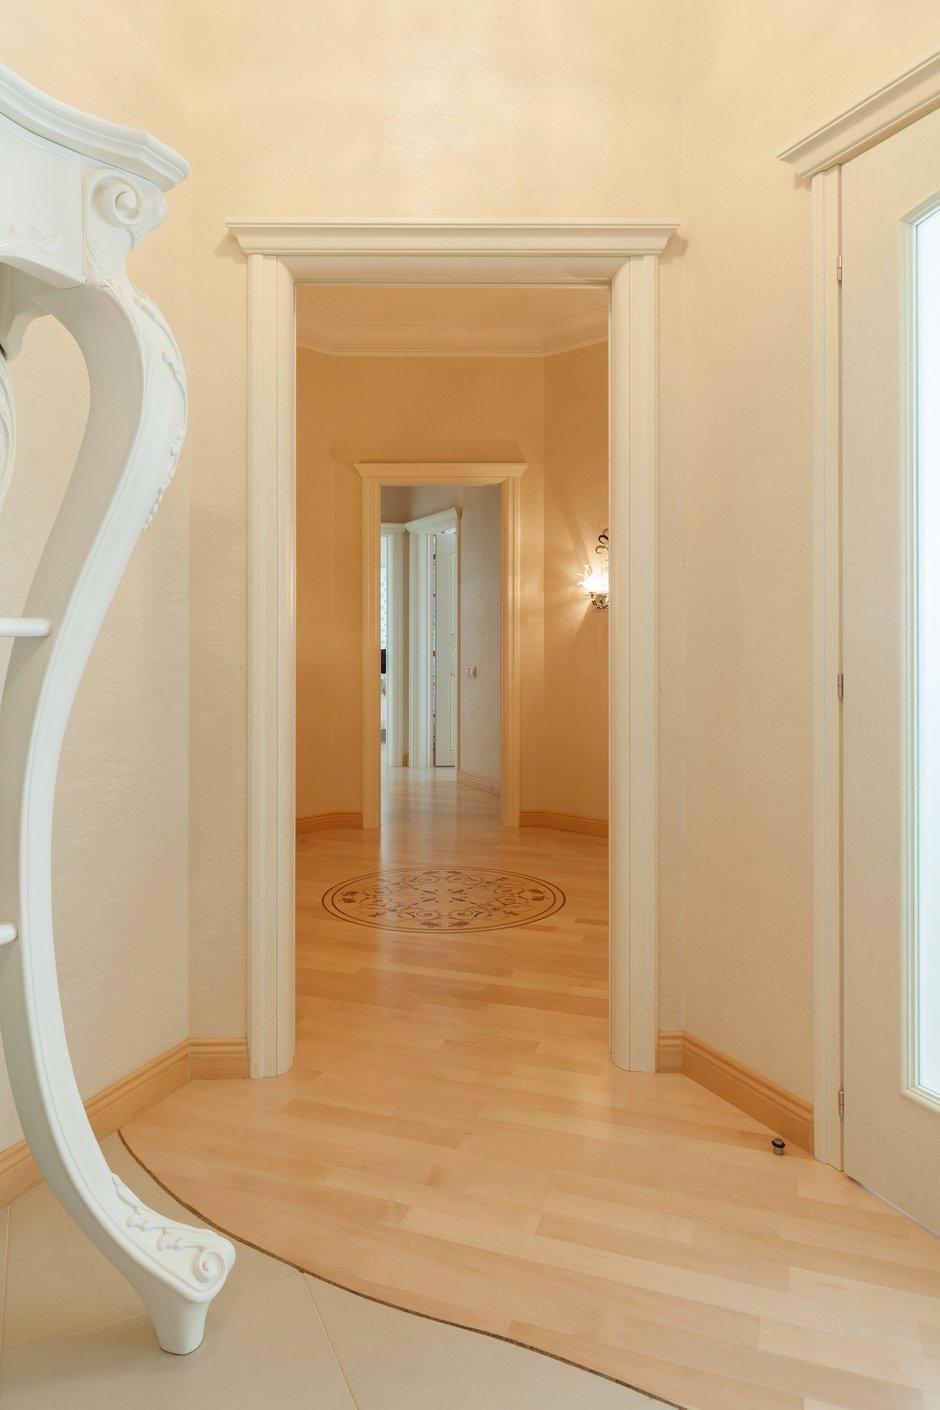 Фотография: Прихожая в стиле Классический, Квартира, Дома и квартиры, Проект недели, Москва – фото на INMYROOM